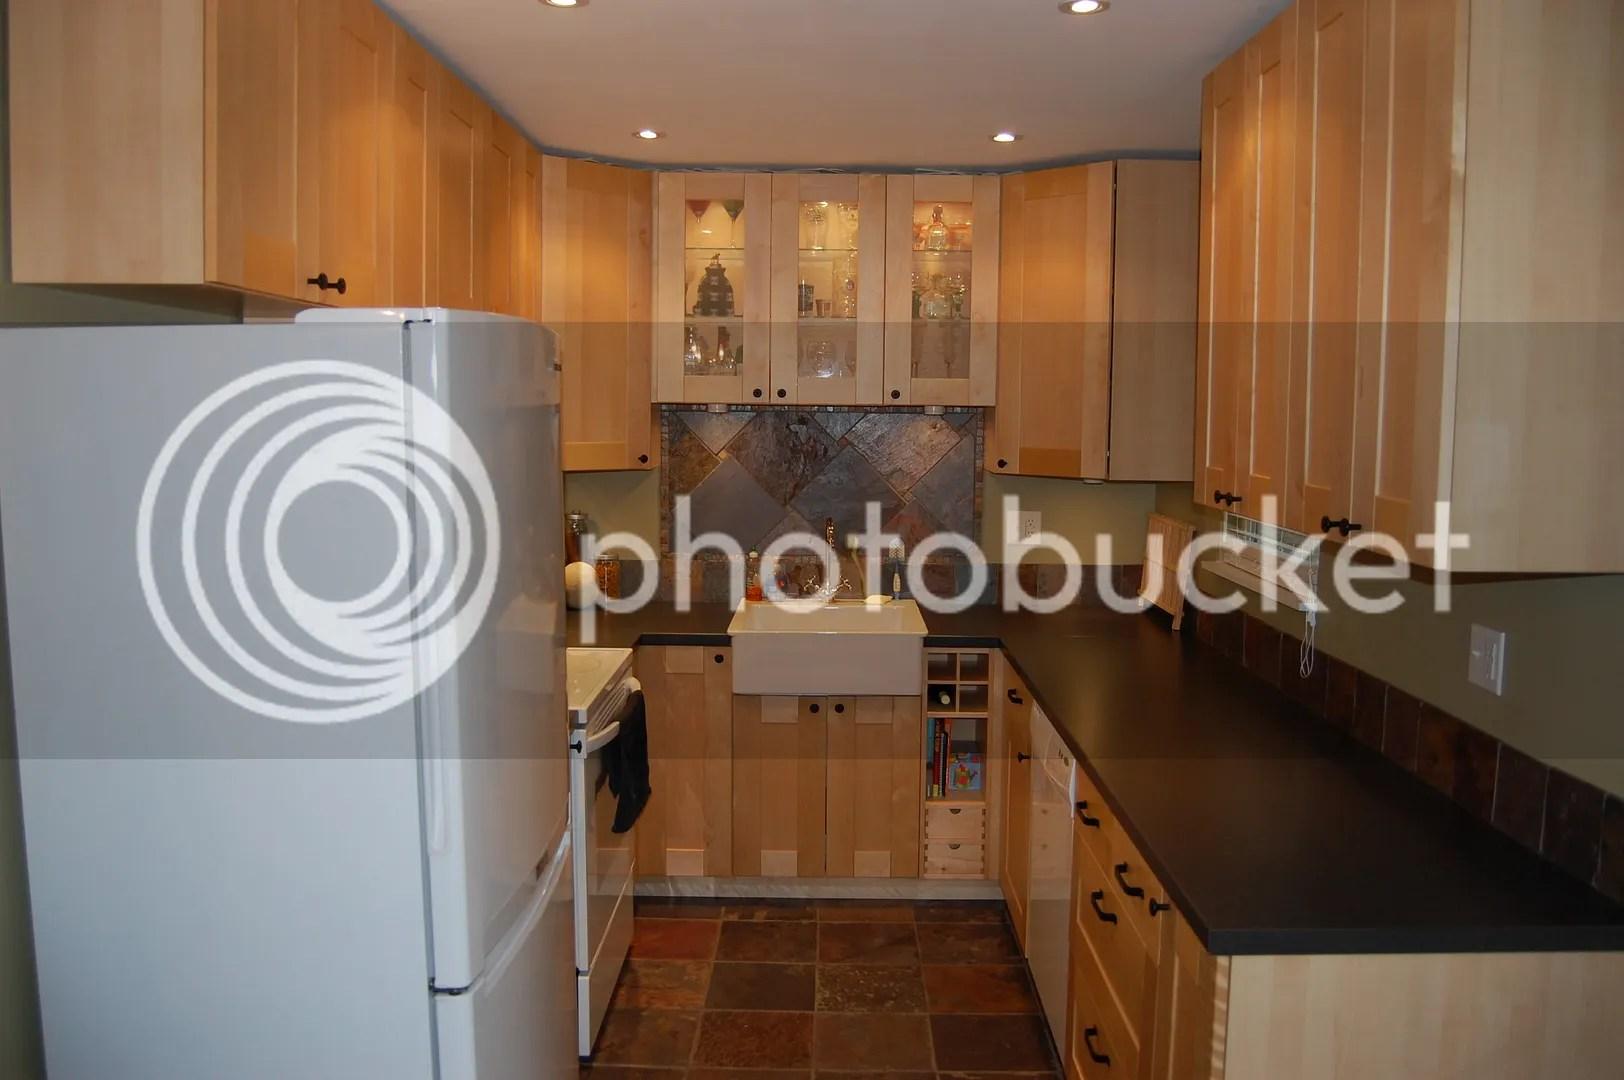 showthread ikea kitchen remodel Thread Ikea Kitchen Cabinets